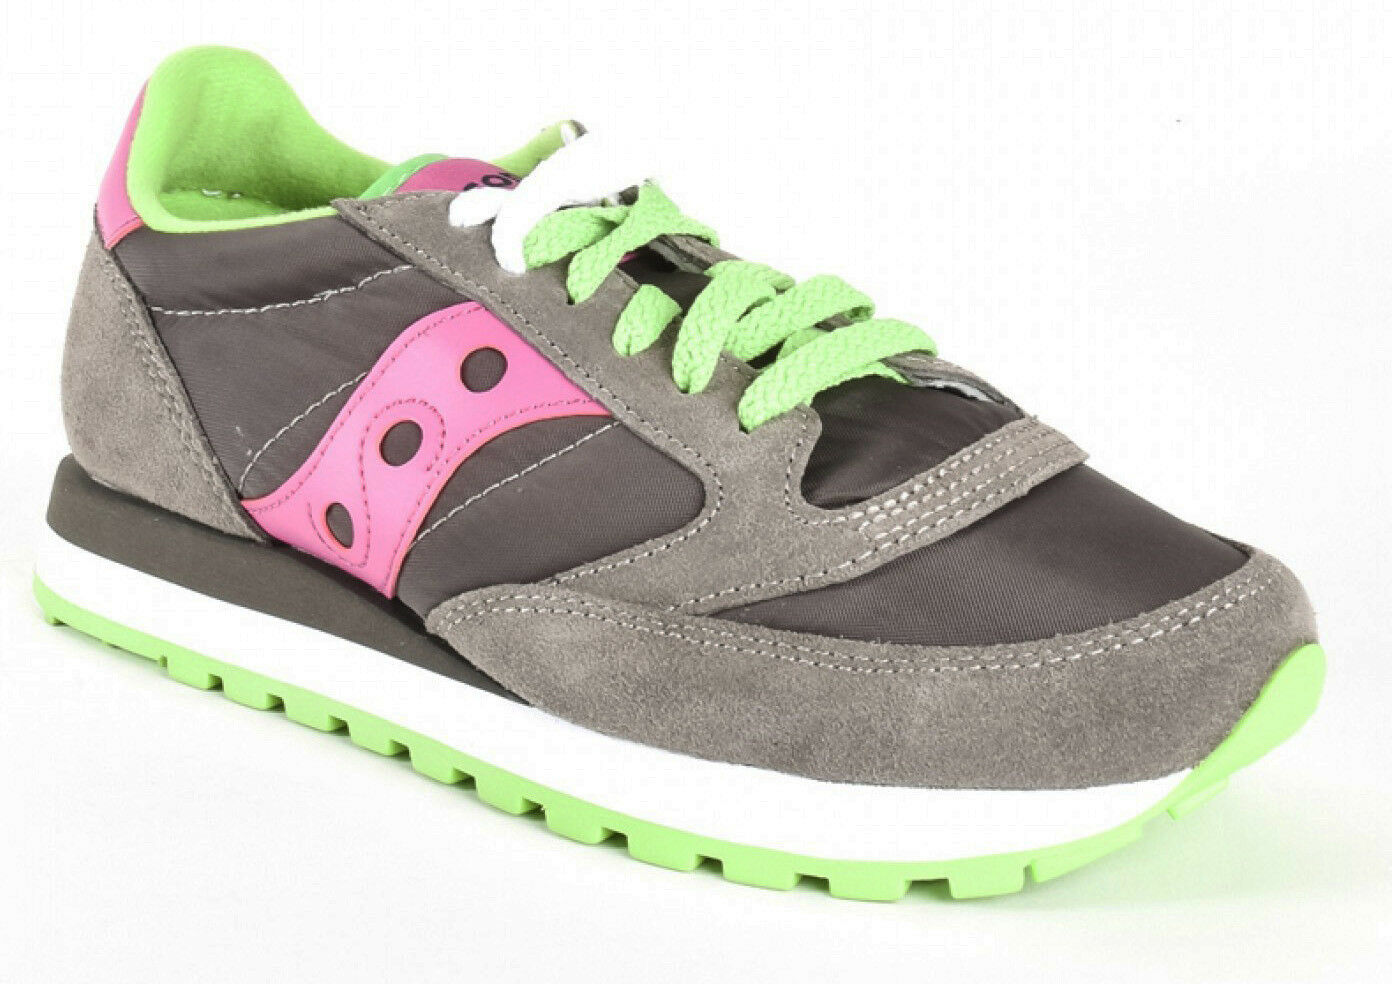 zapatos DA mujer SAUCONY 1044-426 JAZZ JAZZ JAZZ ORIGINALS zapatillas COL. gris SCURO-púrpura  mas barato